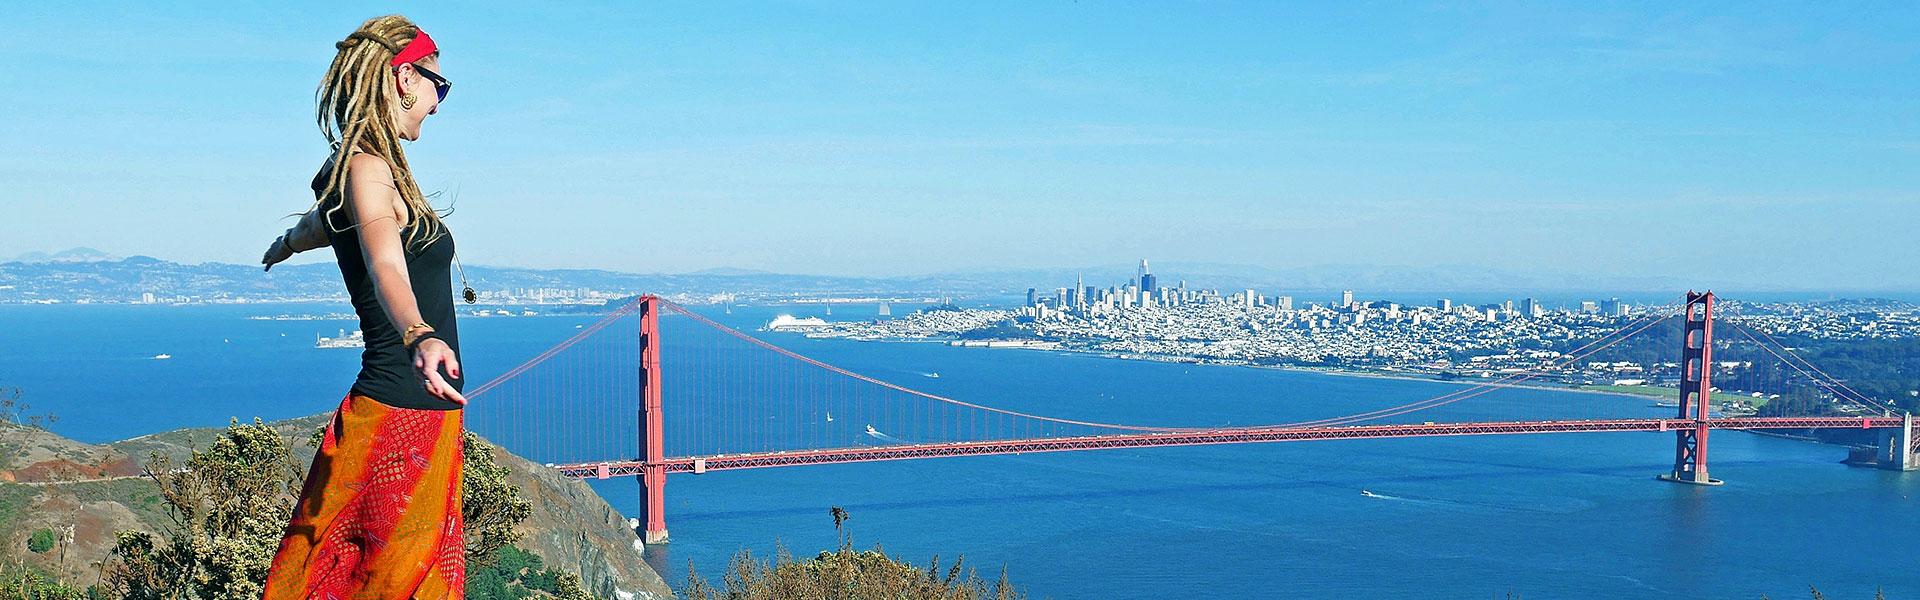 Rasta girl at Marin Headlands overlooking Golden Gate Bridge, city and San Francisco Bay